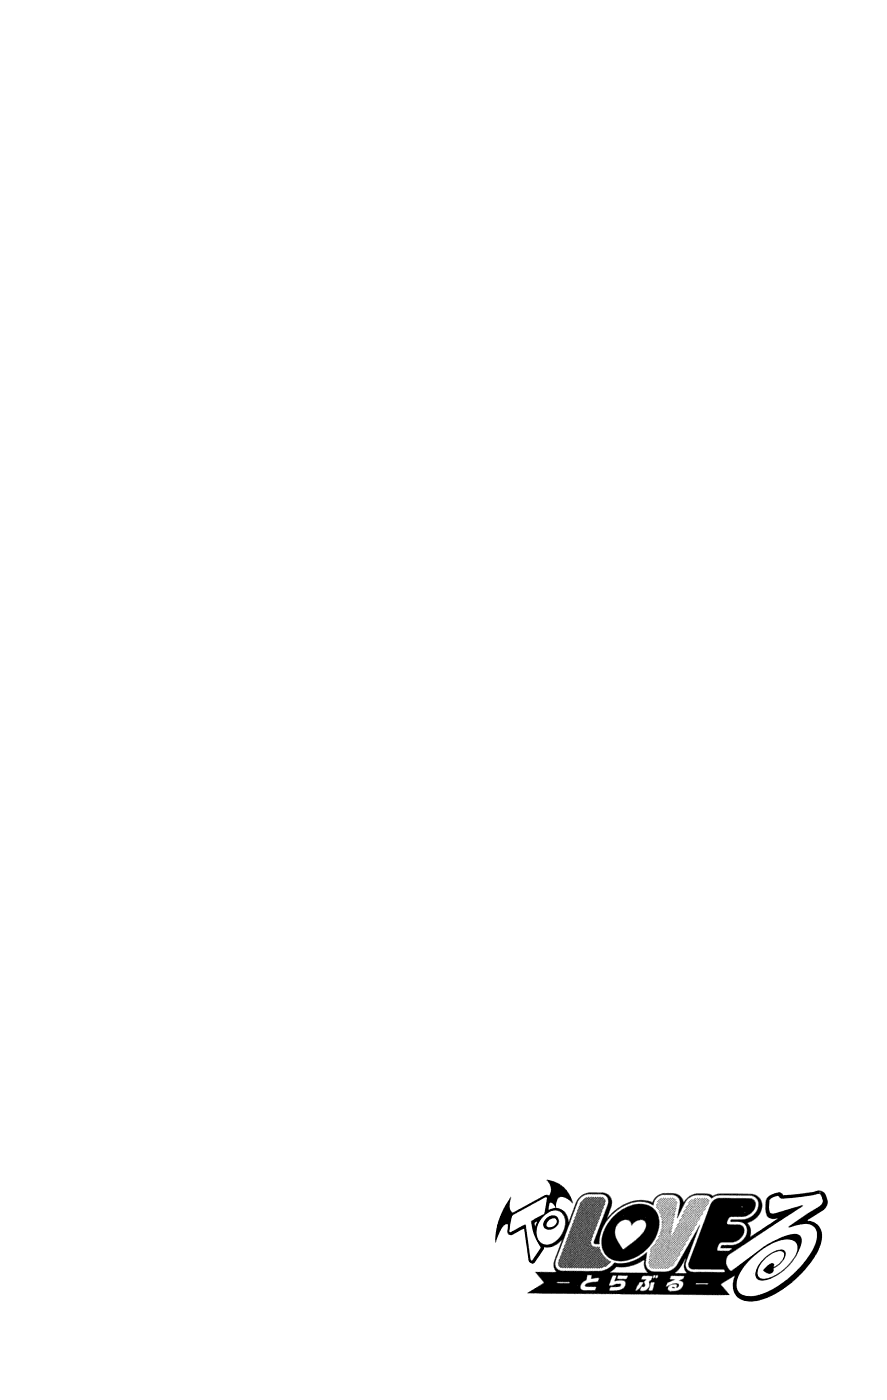 Манга Любовные неприятности / To Love-Ru  - Том 7 Глава 57 Страница 20